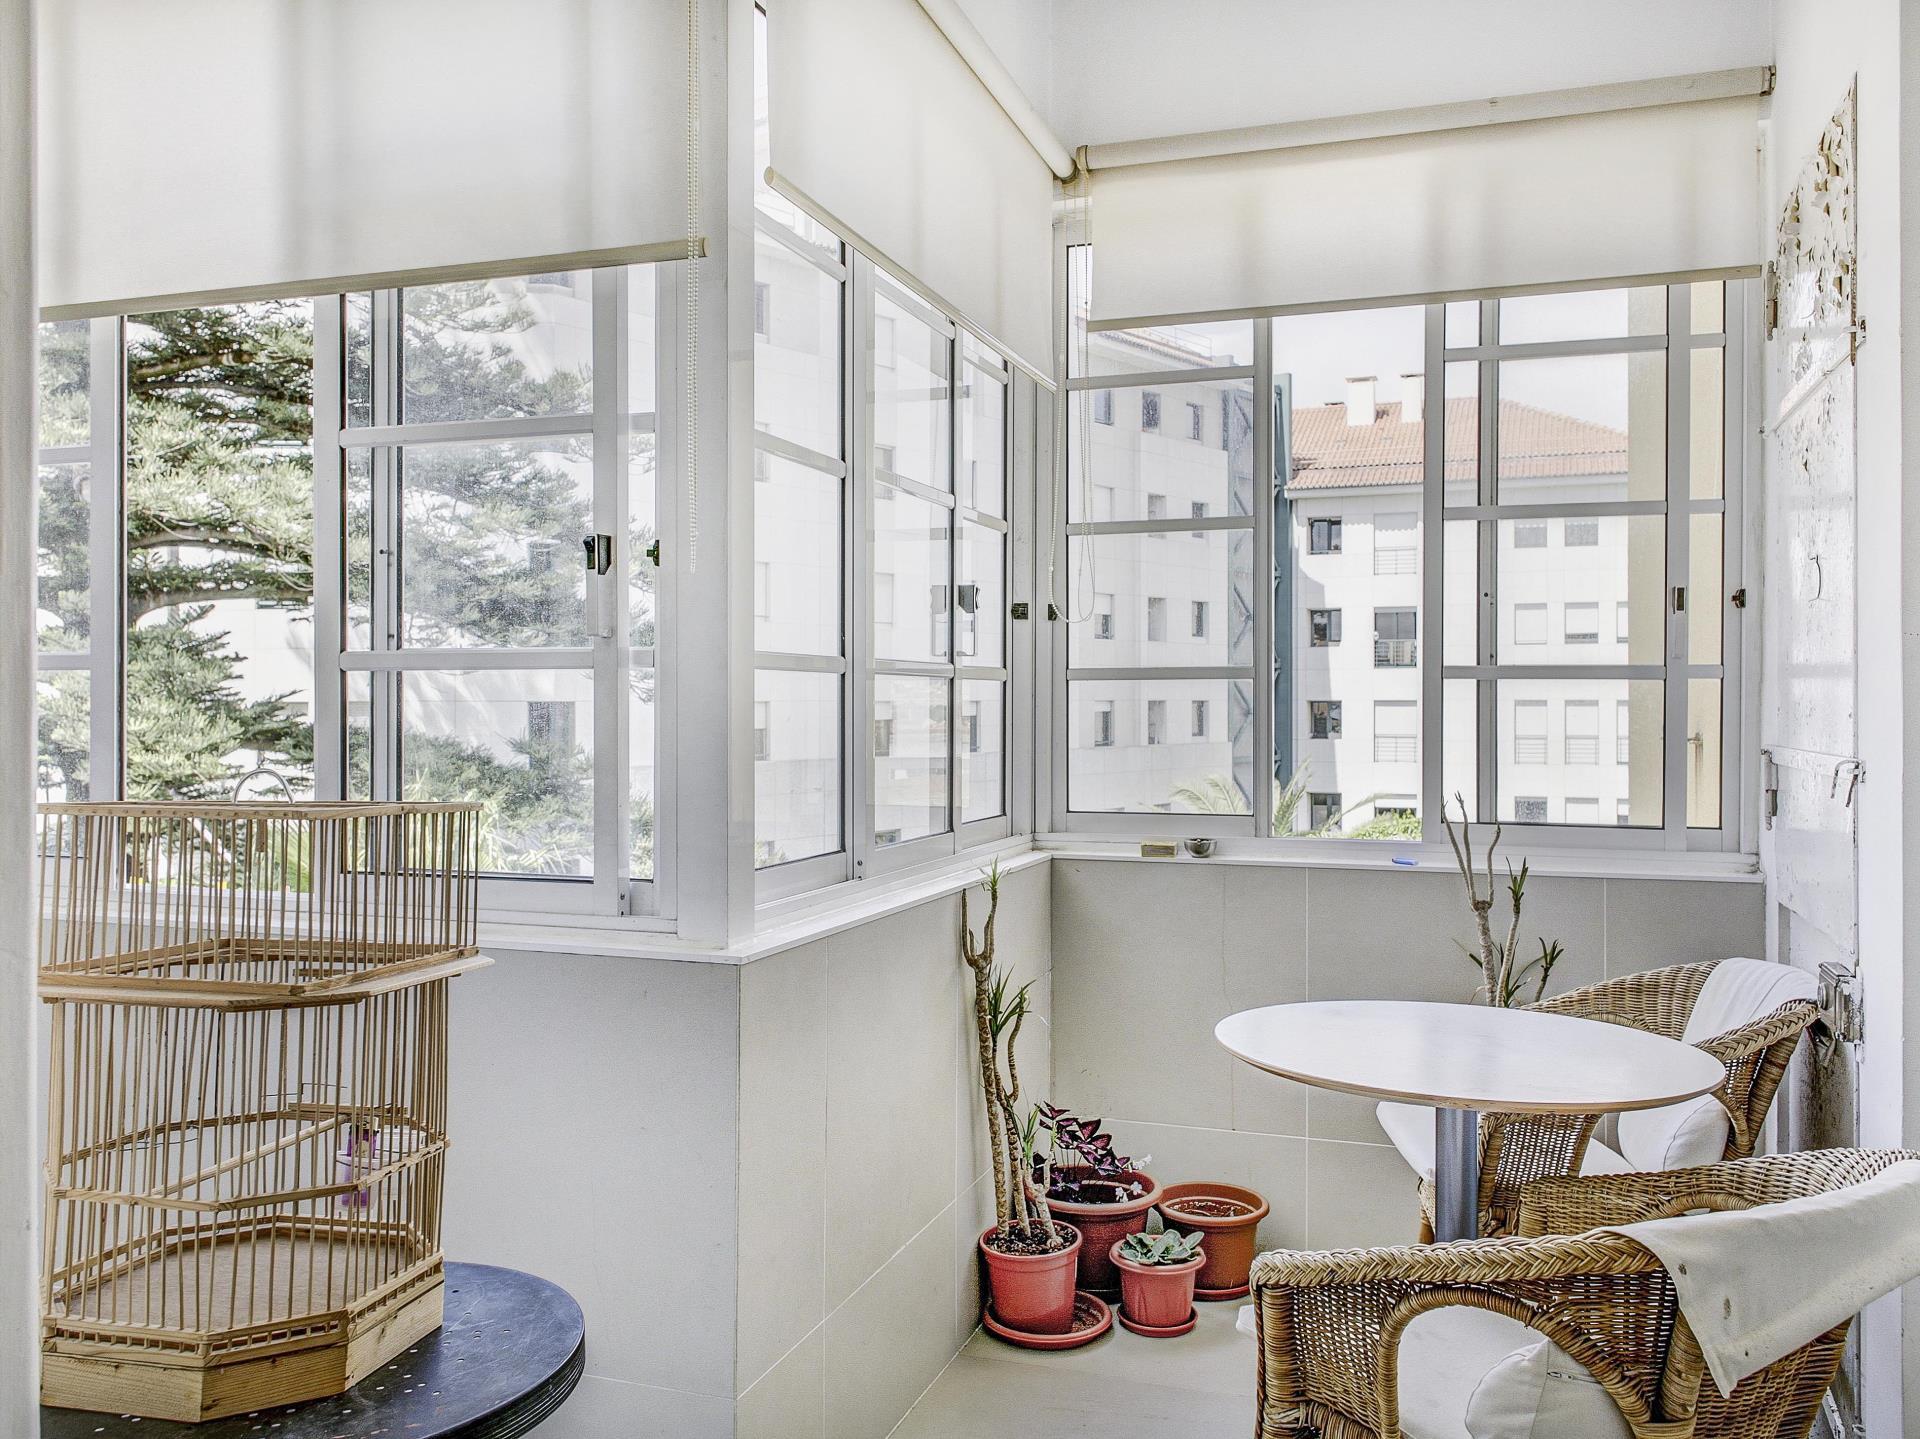 Apartment for Sale at Flat, 4 bedrooms, for Sale Graca, Lisboa, Lisboa Portugal